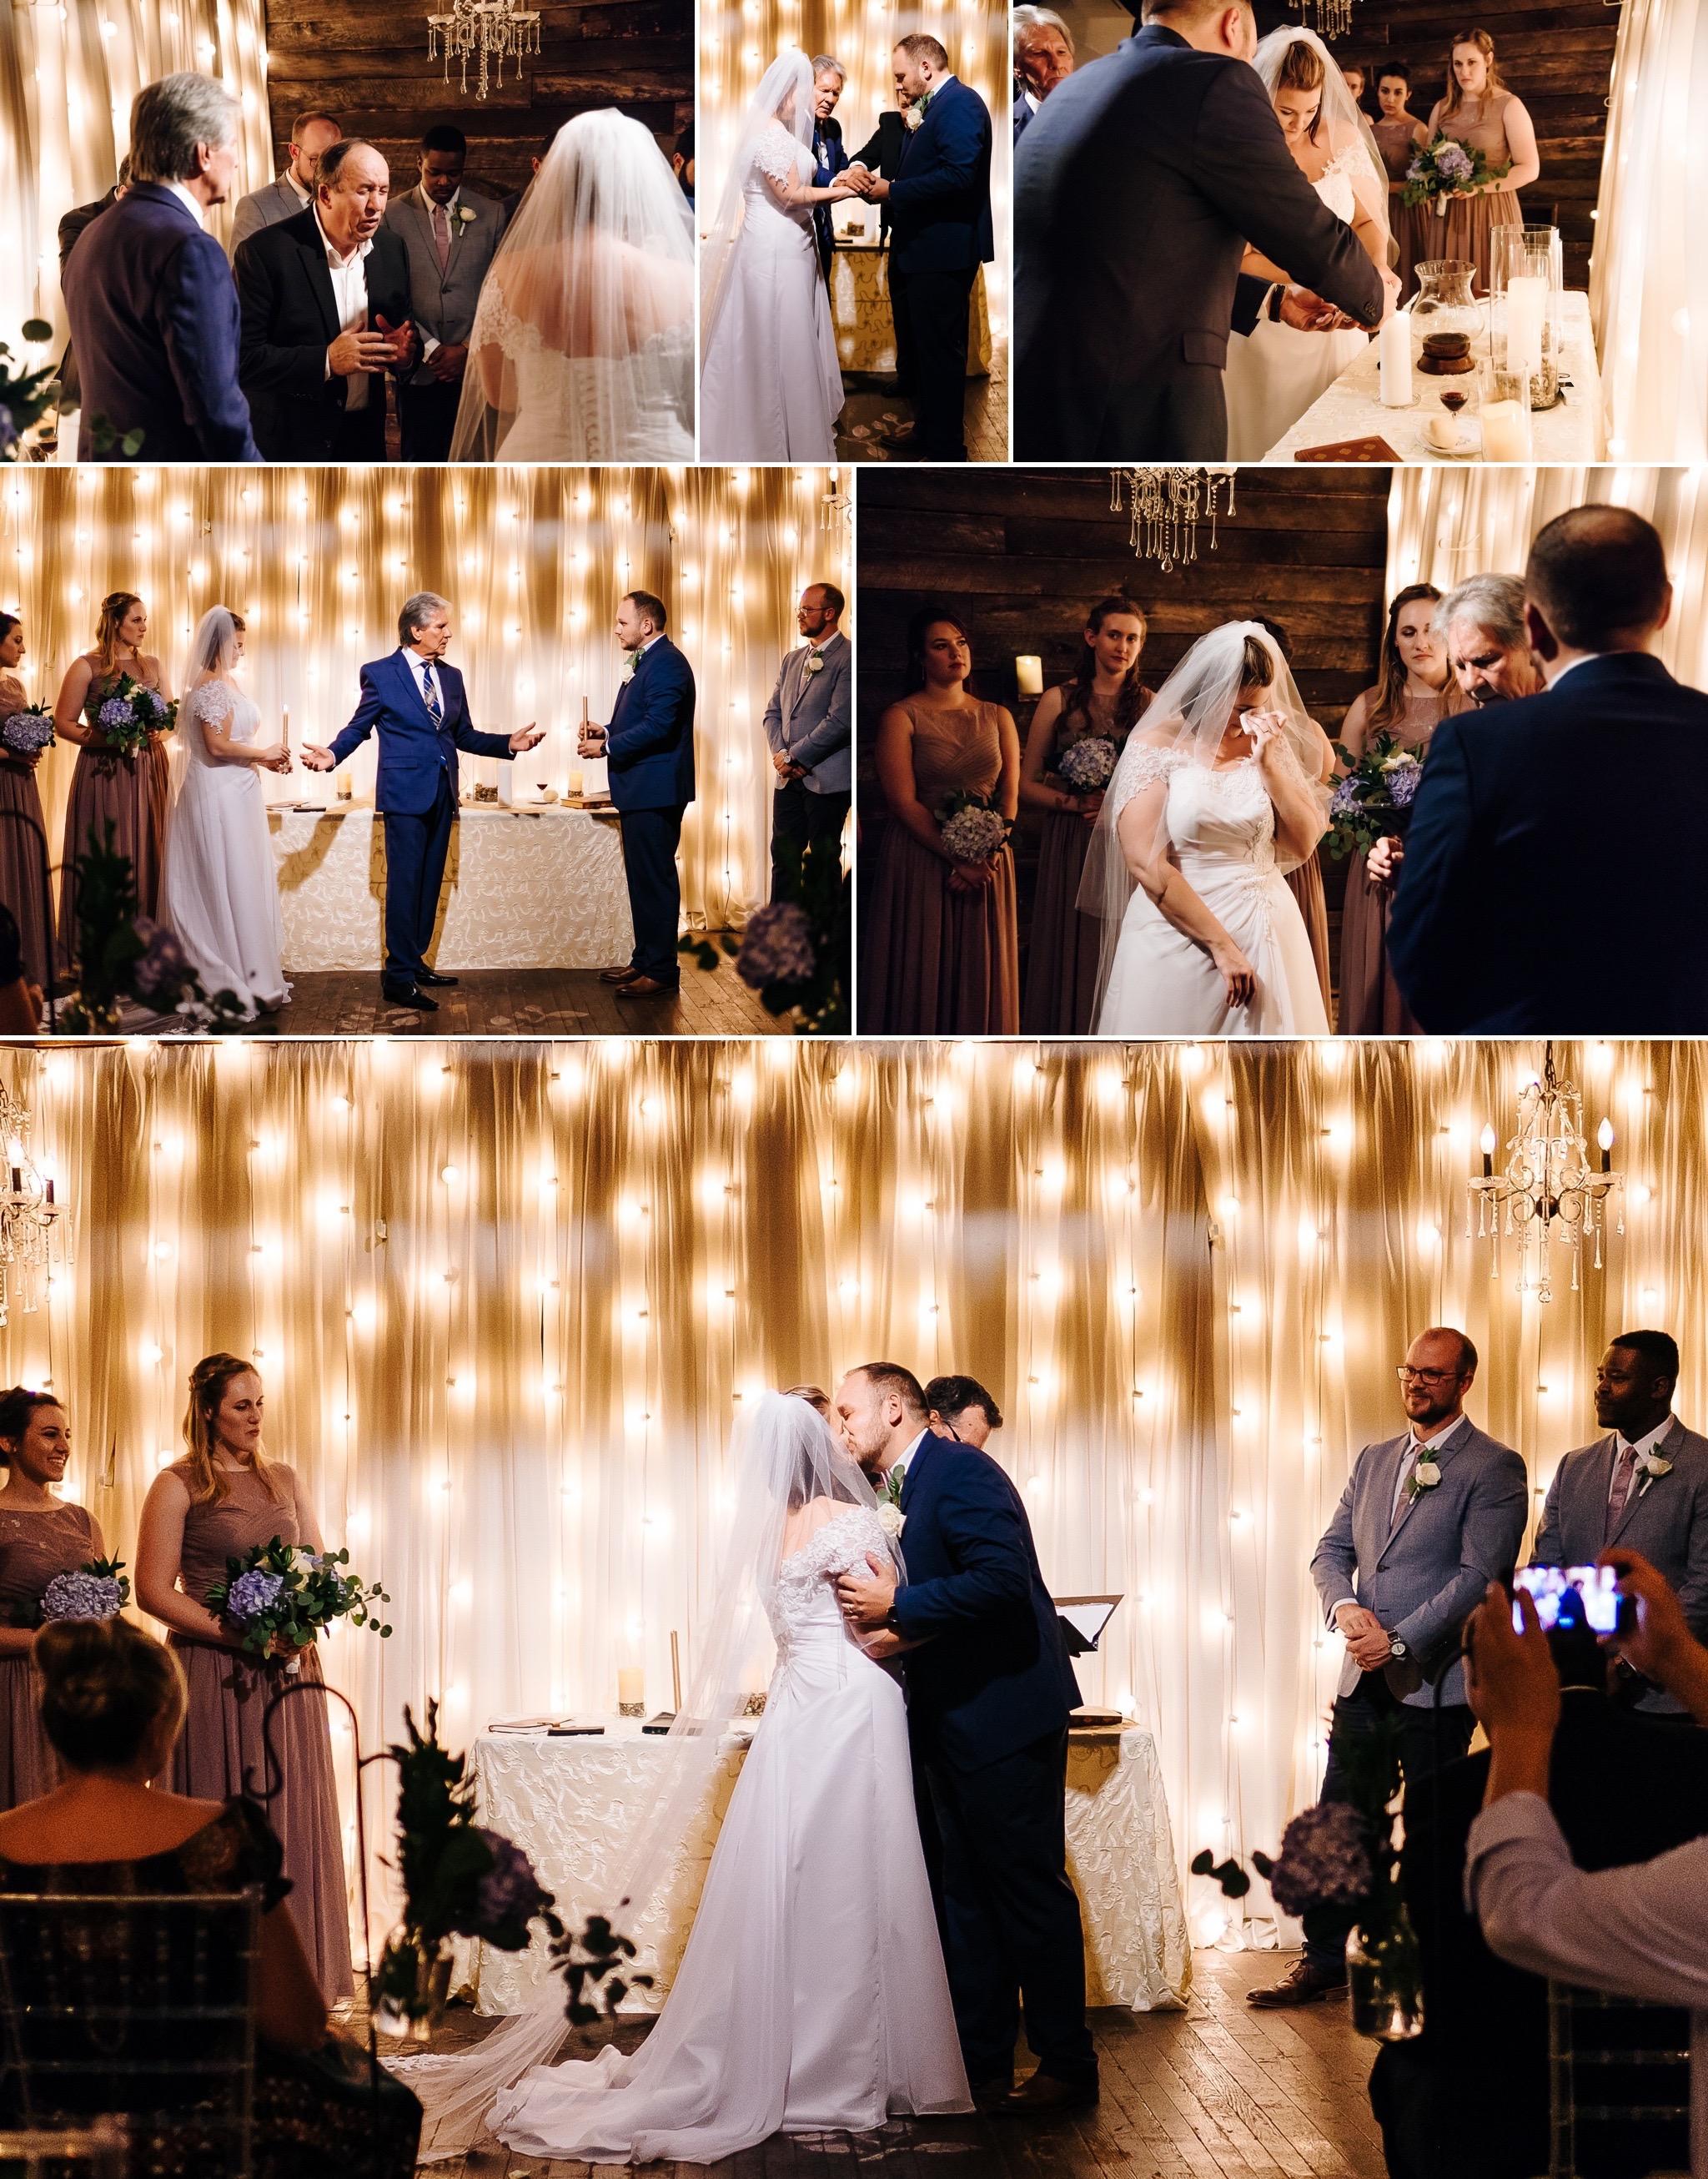 intimate_kyle_house_wedding_virginia_jonathan_hannah_photography-12.jpg